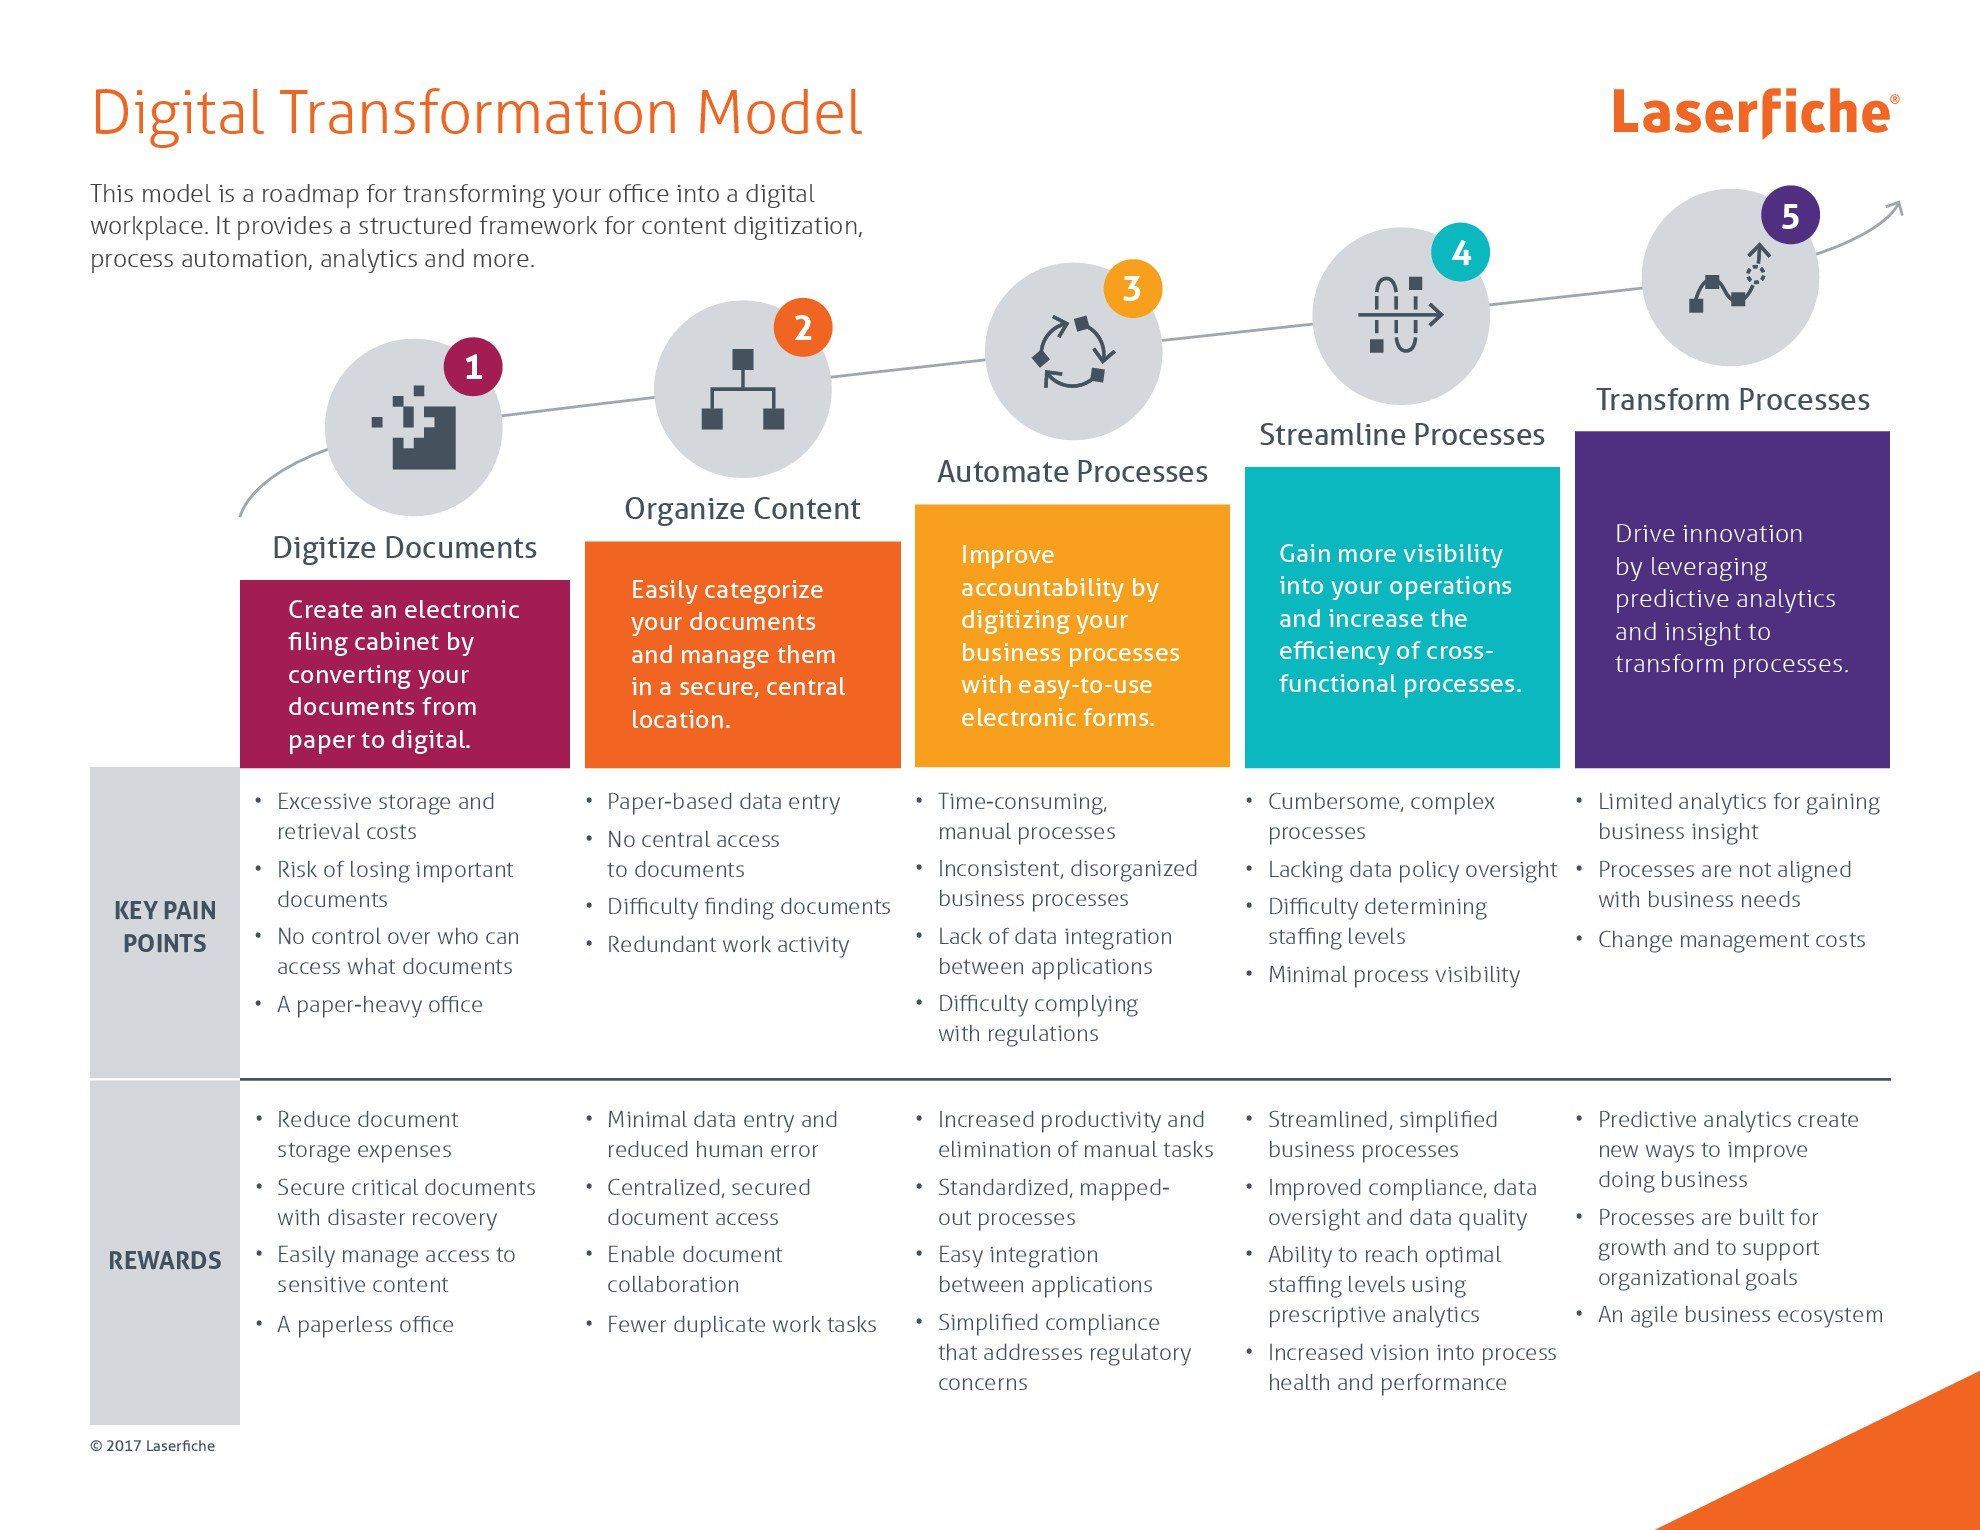 Laserfiche-digital-transformation-model[1]